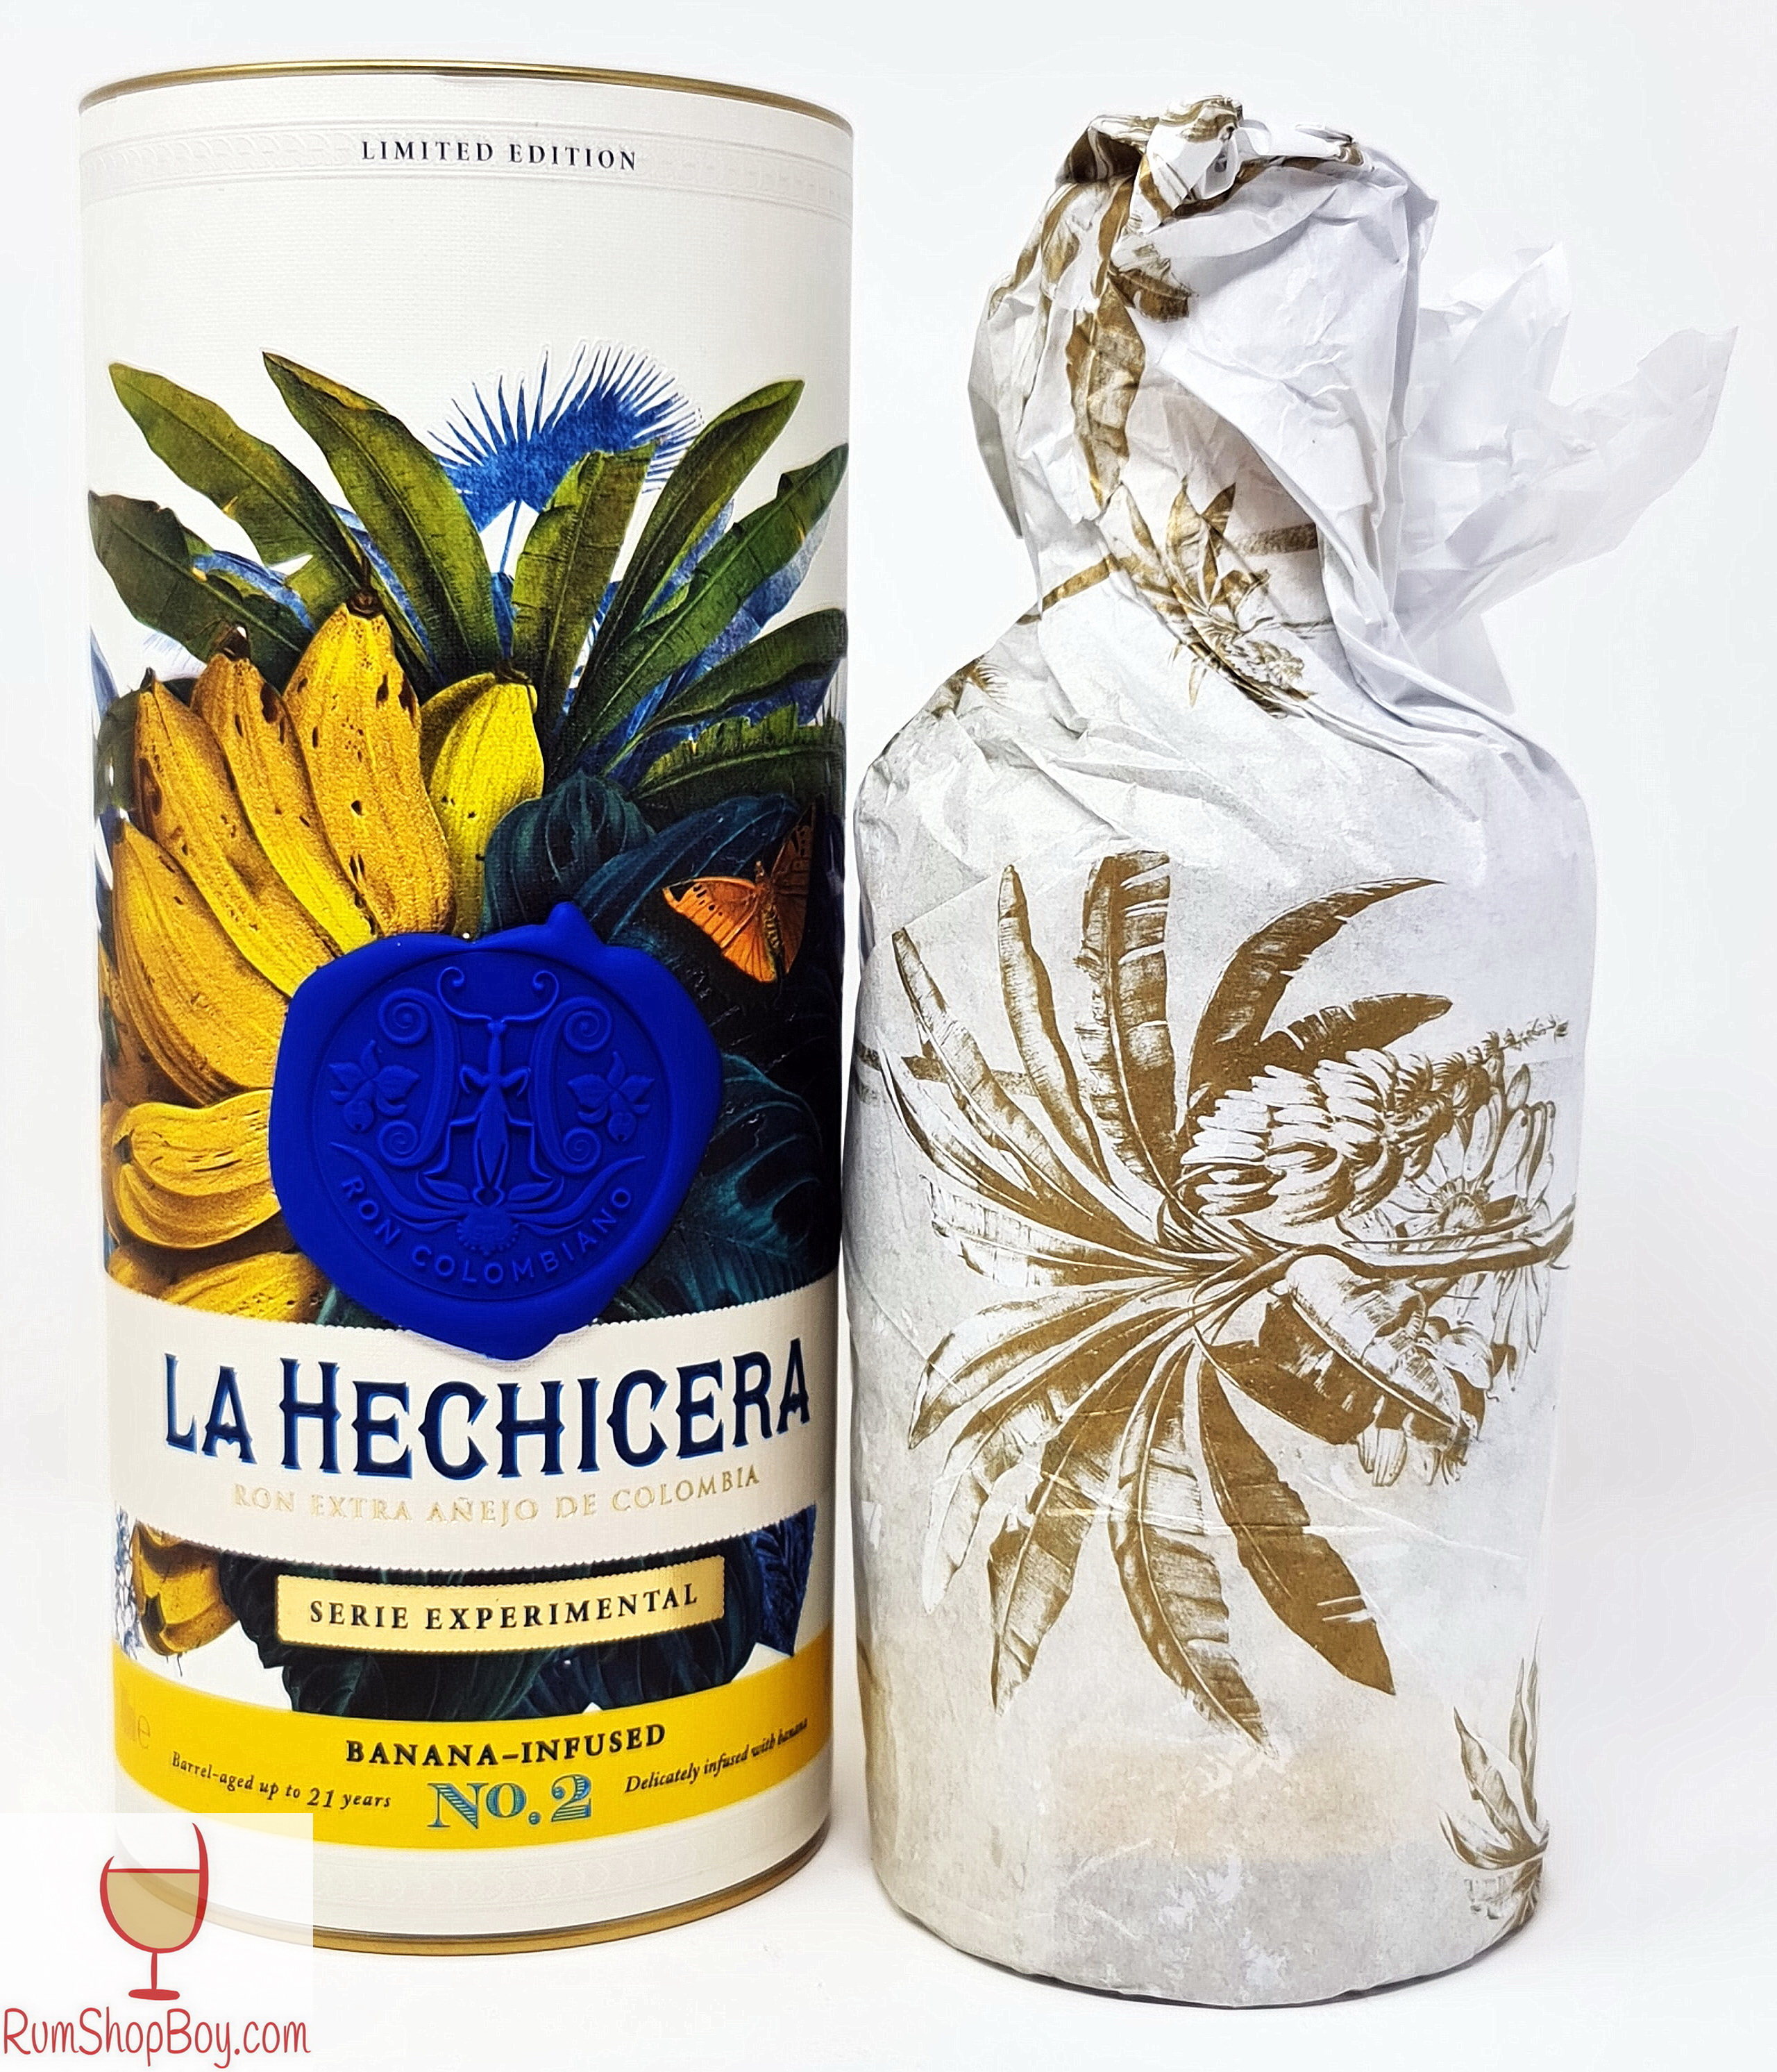 La Hechicera Banana Infused Rum Tin and Bottle